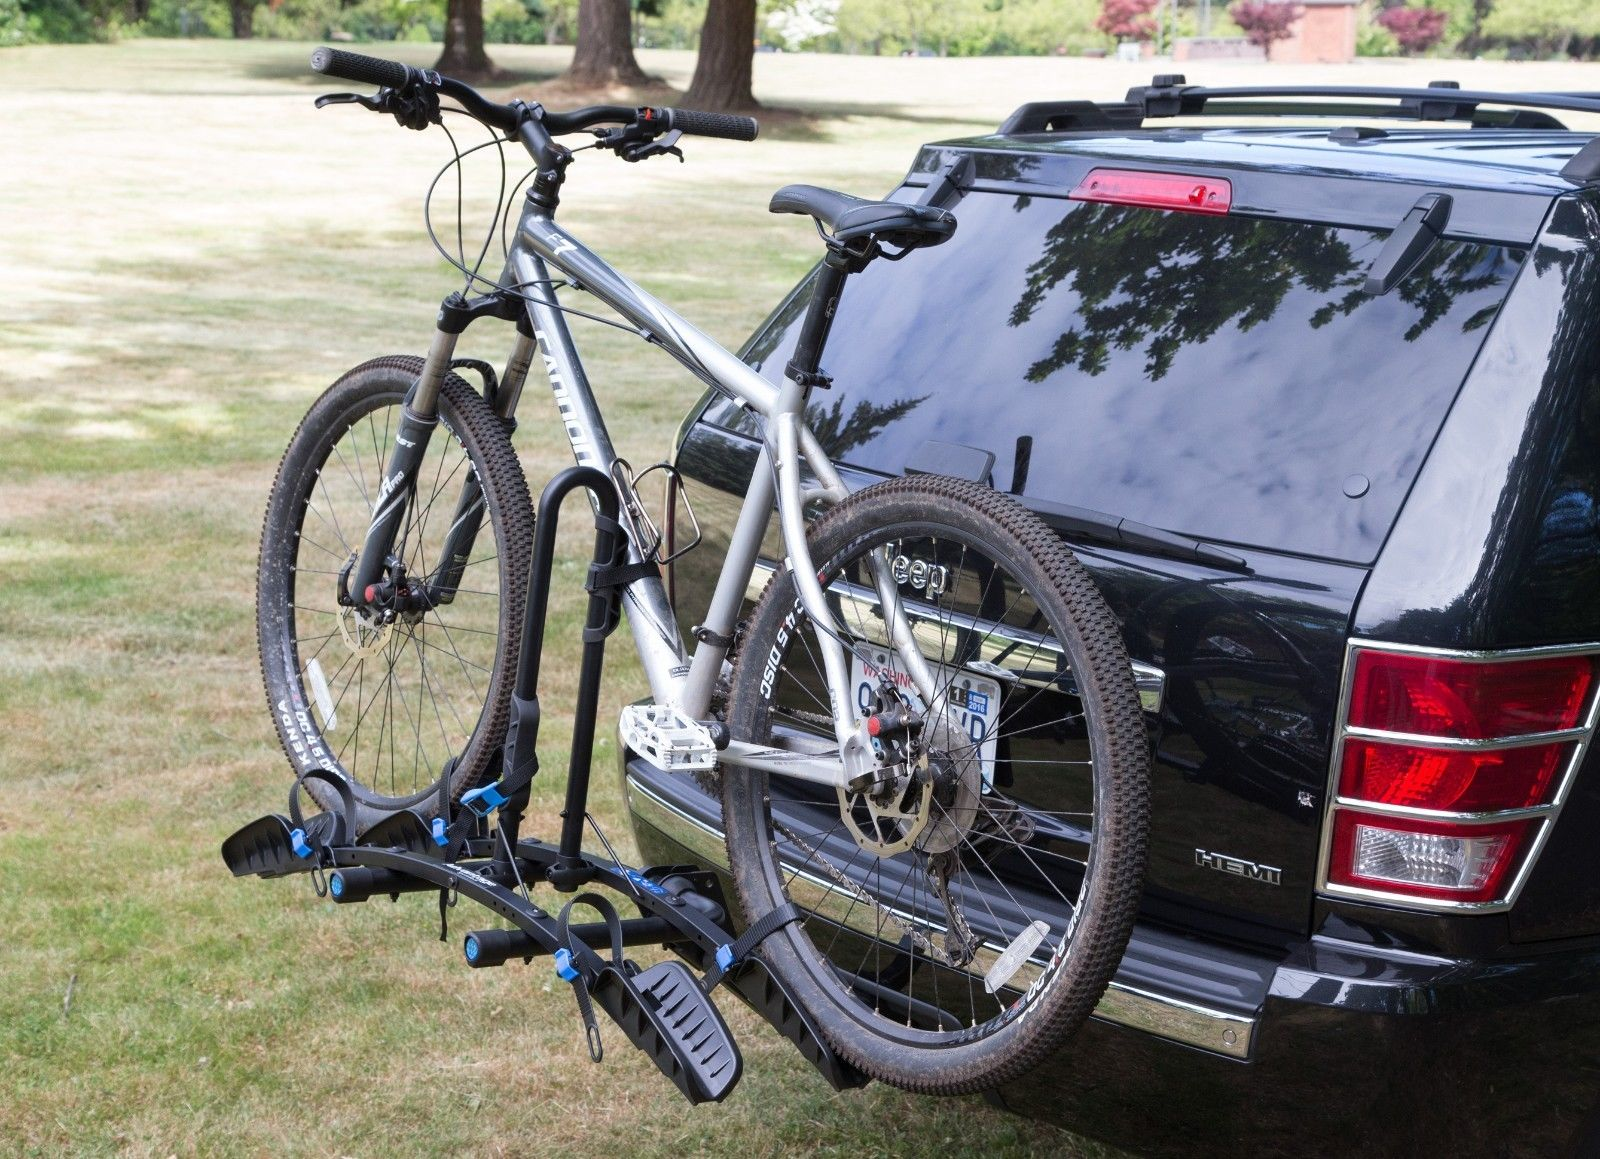 USサイクルキャリア Advantage SportsRack FlatRack 2 bike carrier 2